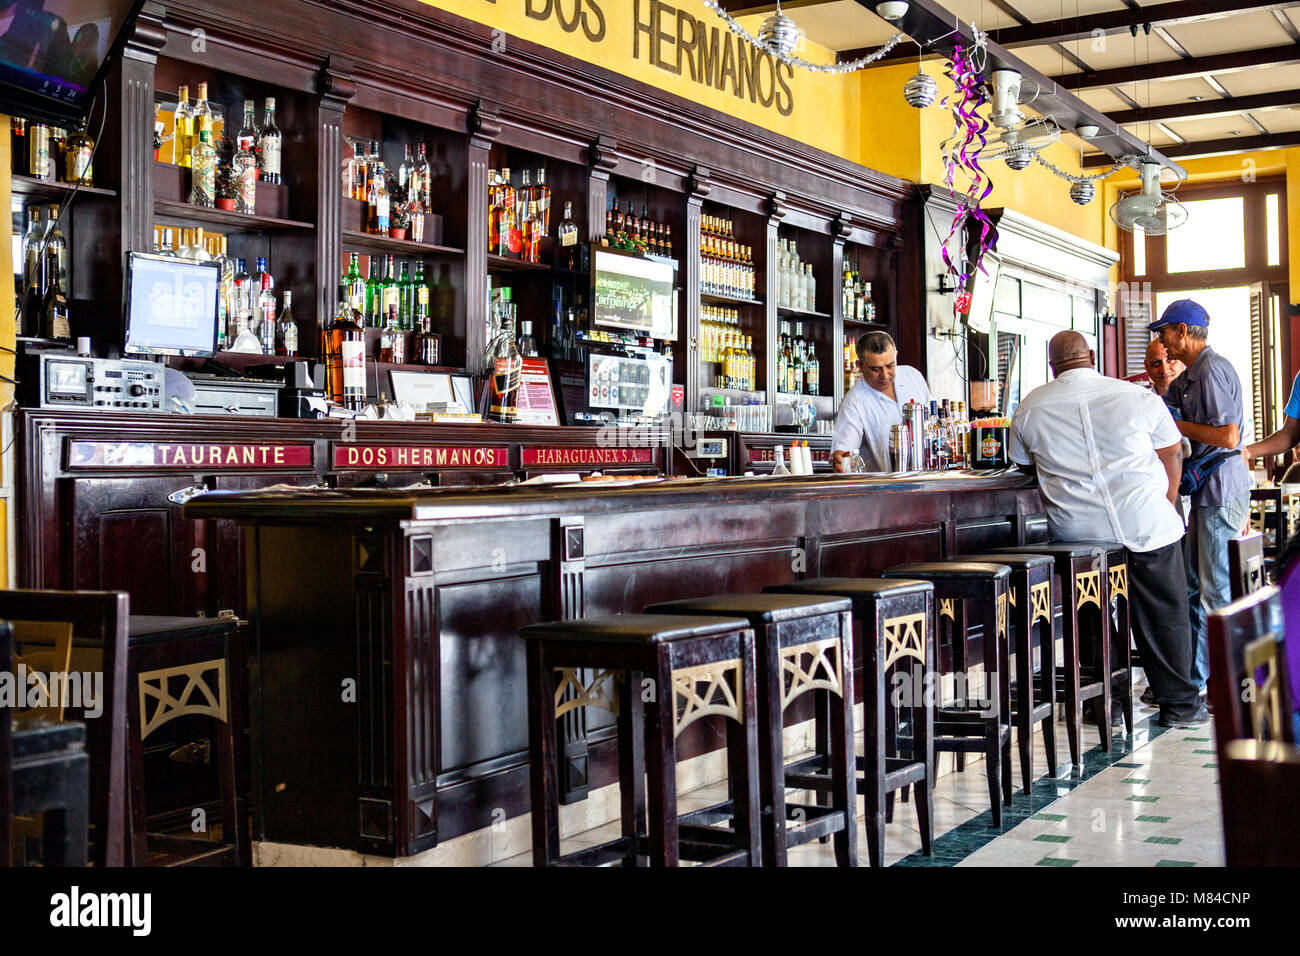 Havanna, Kuba - Dezember 12, 2016: Mojito Cocktail in einer Bar in Kuba/Havanna in Havana Club Rum Gläser Stockbild